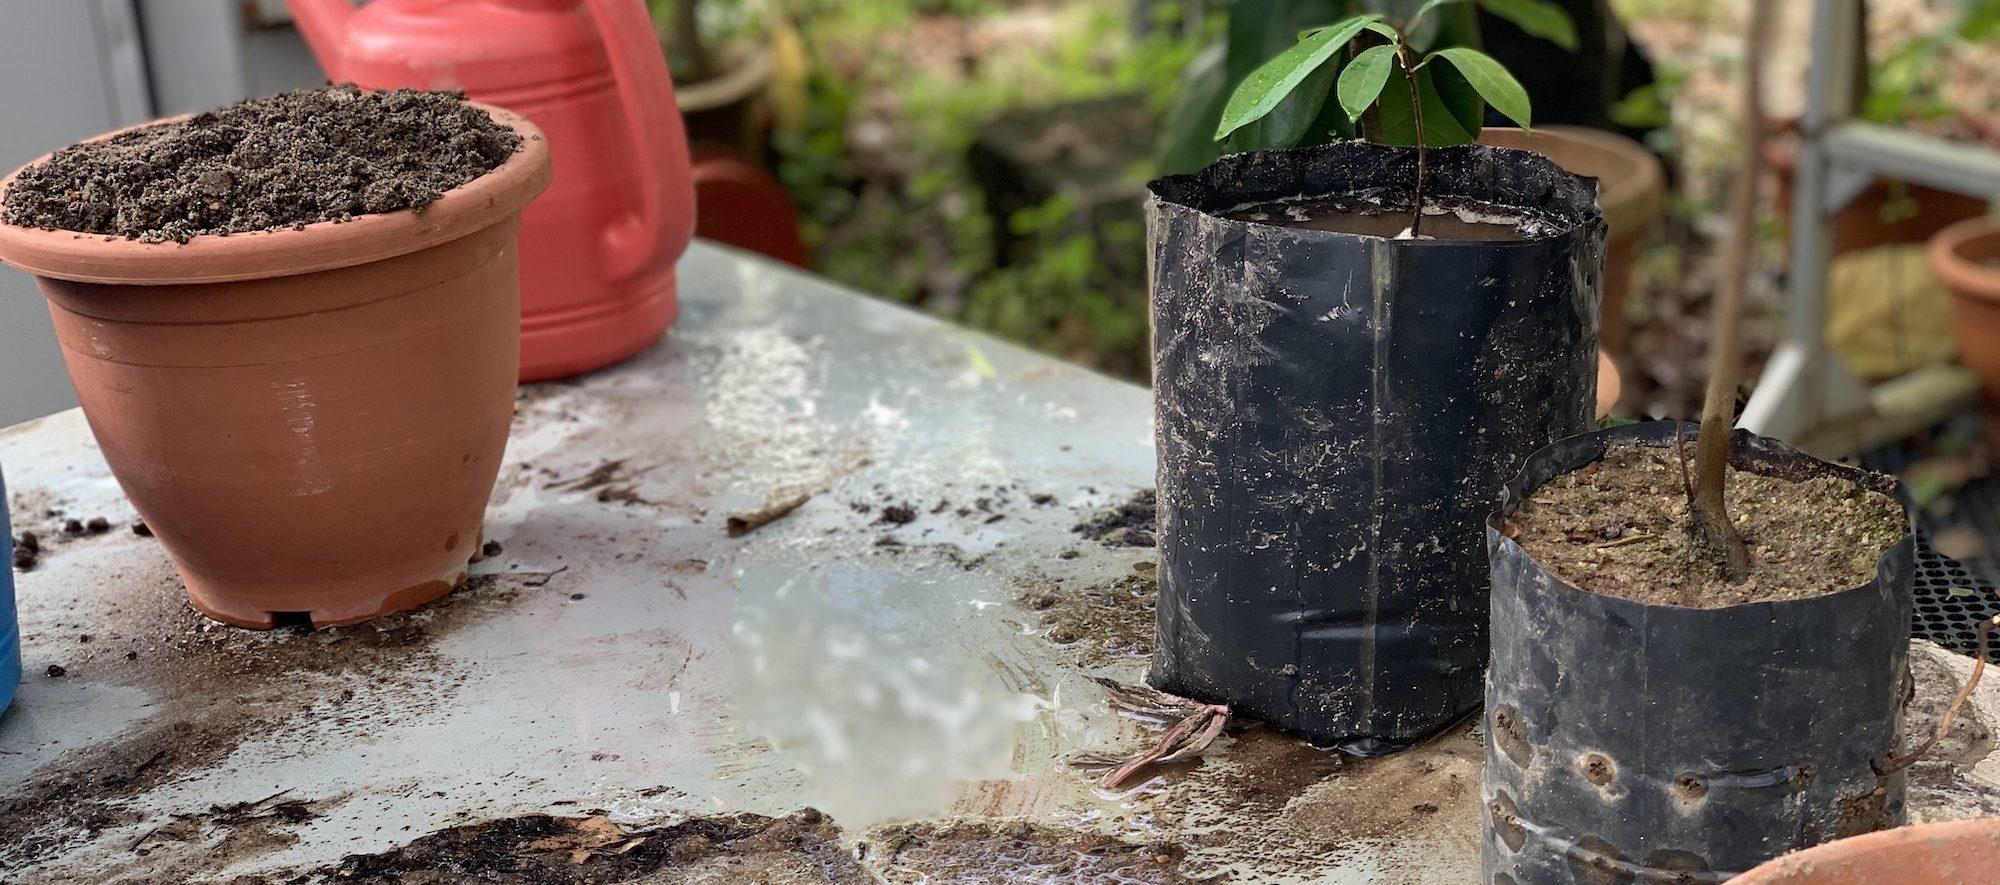 Feb 7 Rainforest Restoration Project